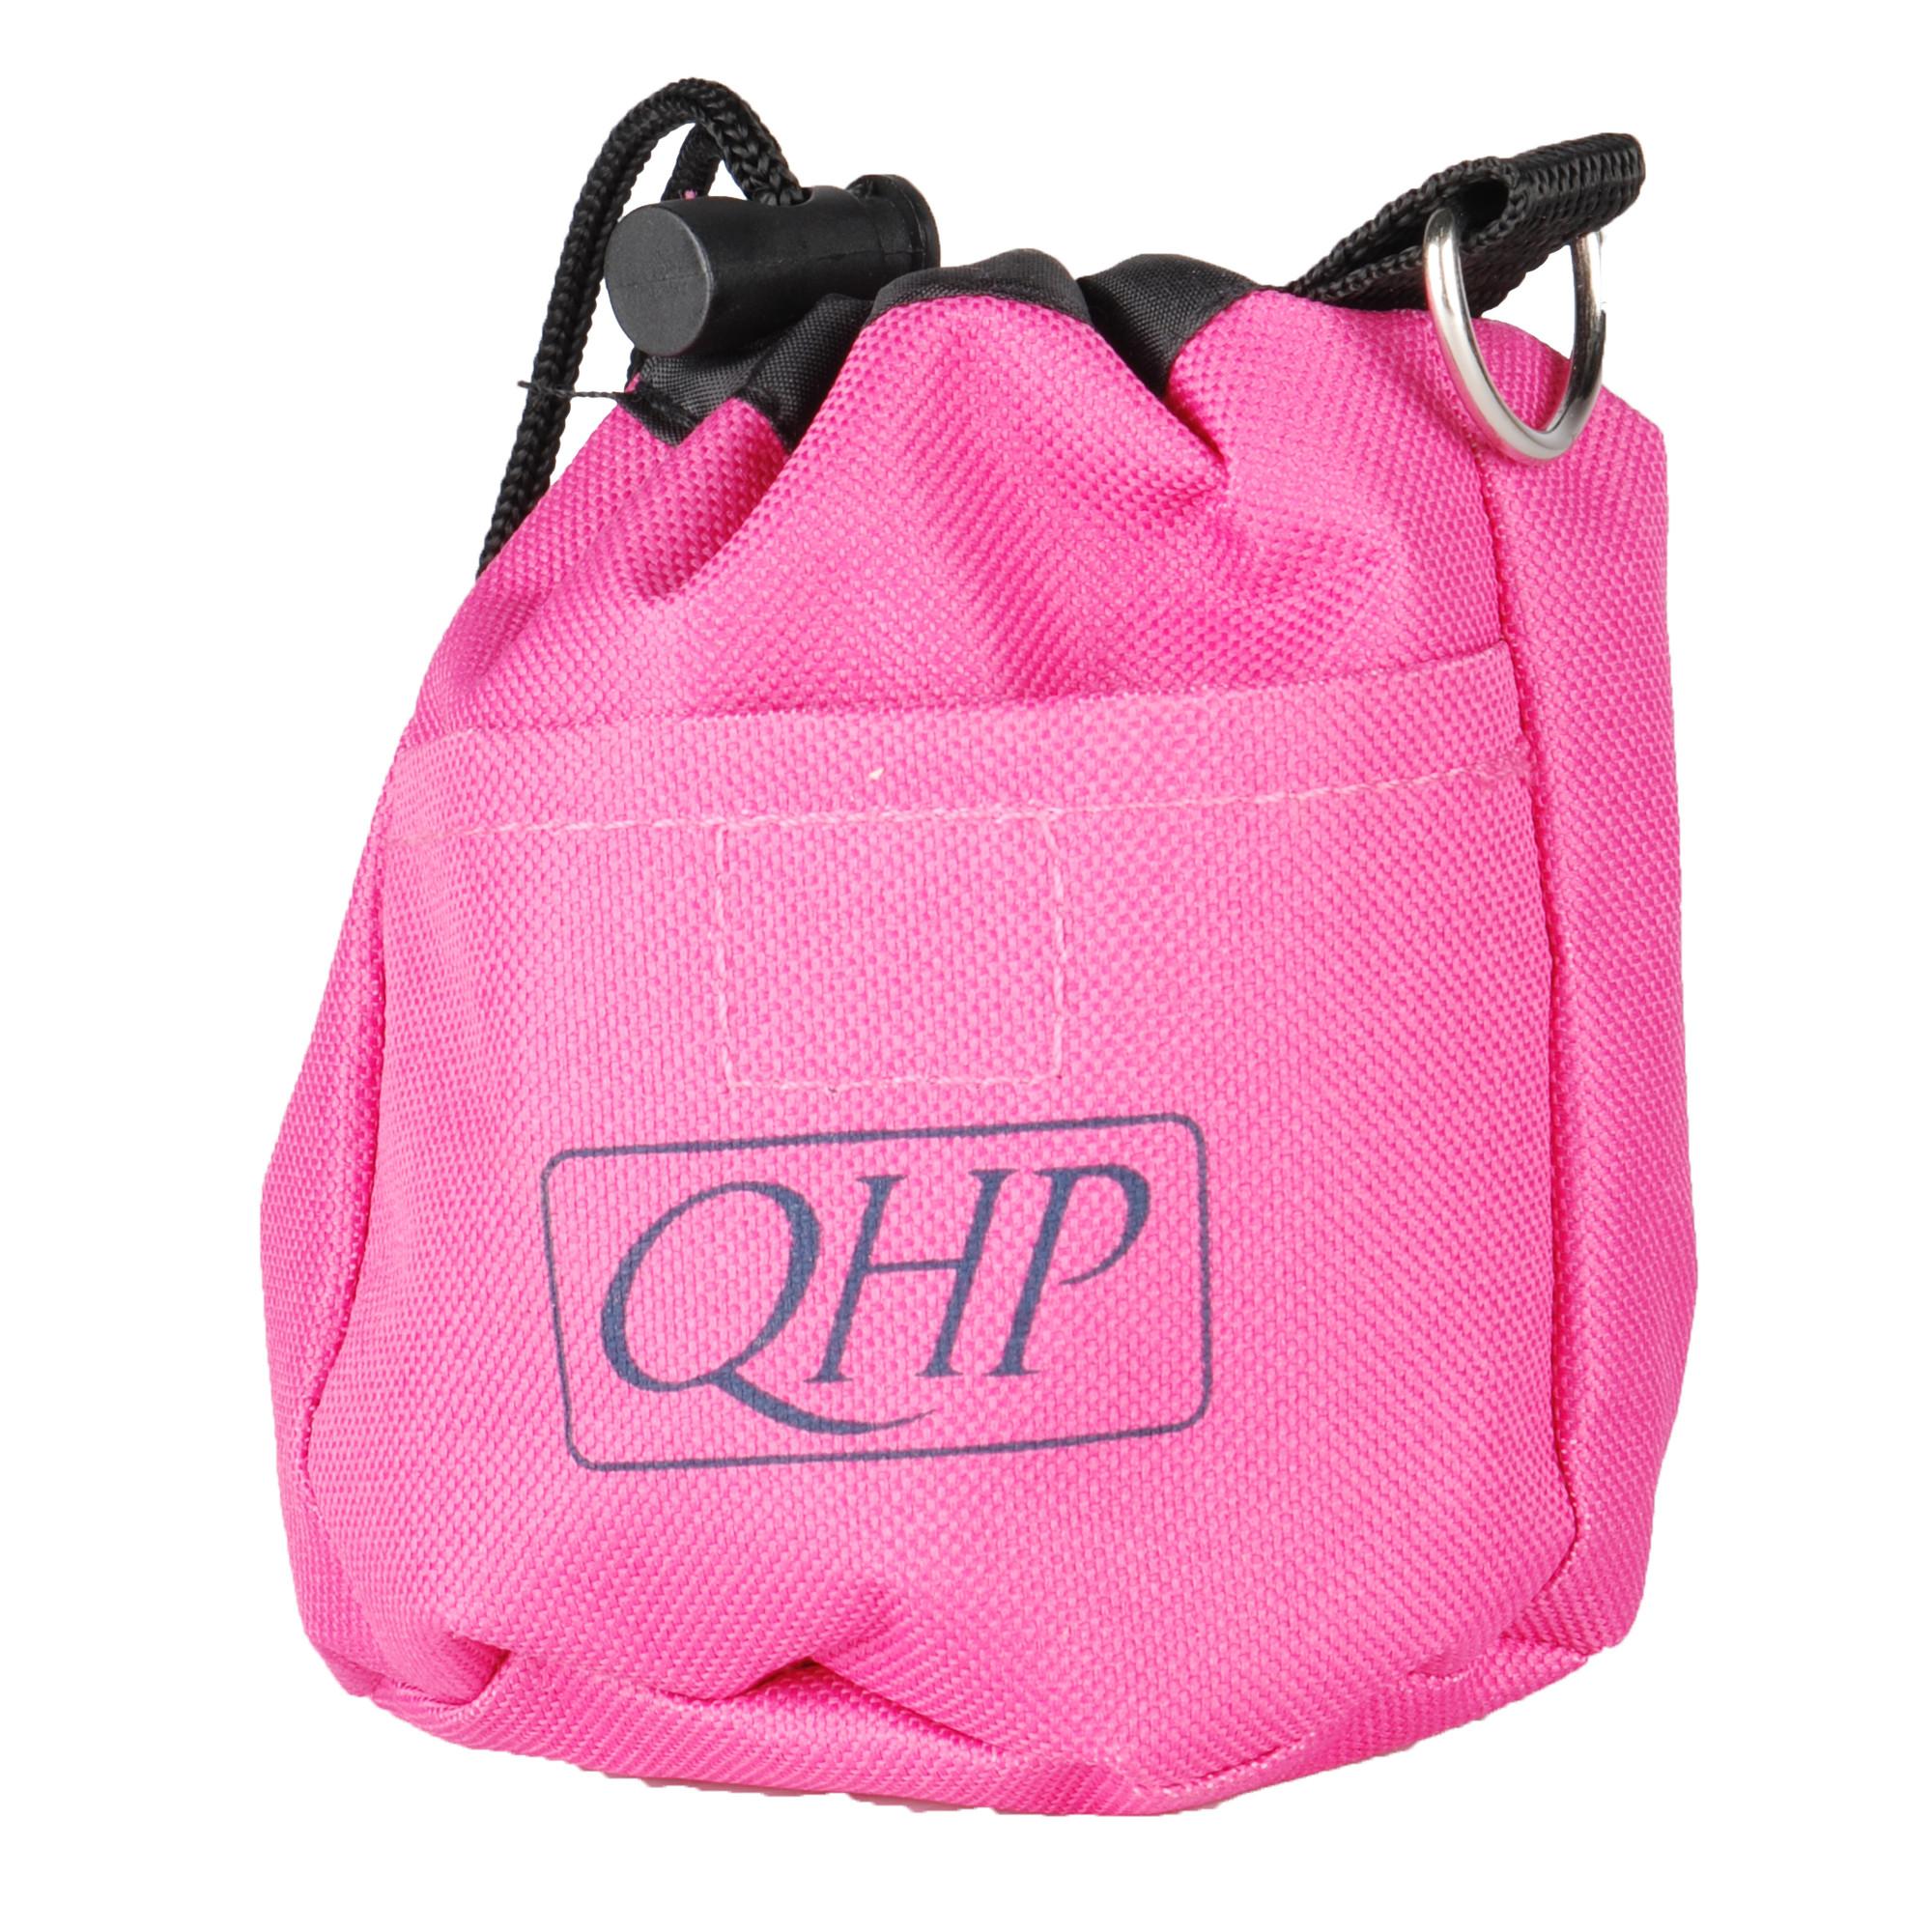 QHP Beloningstas fuchsia